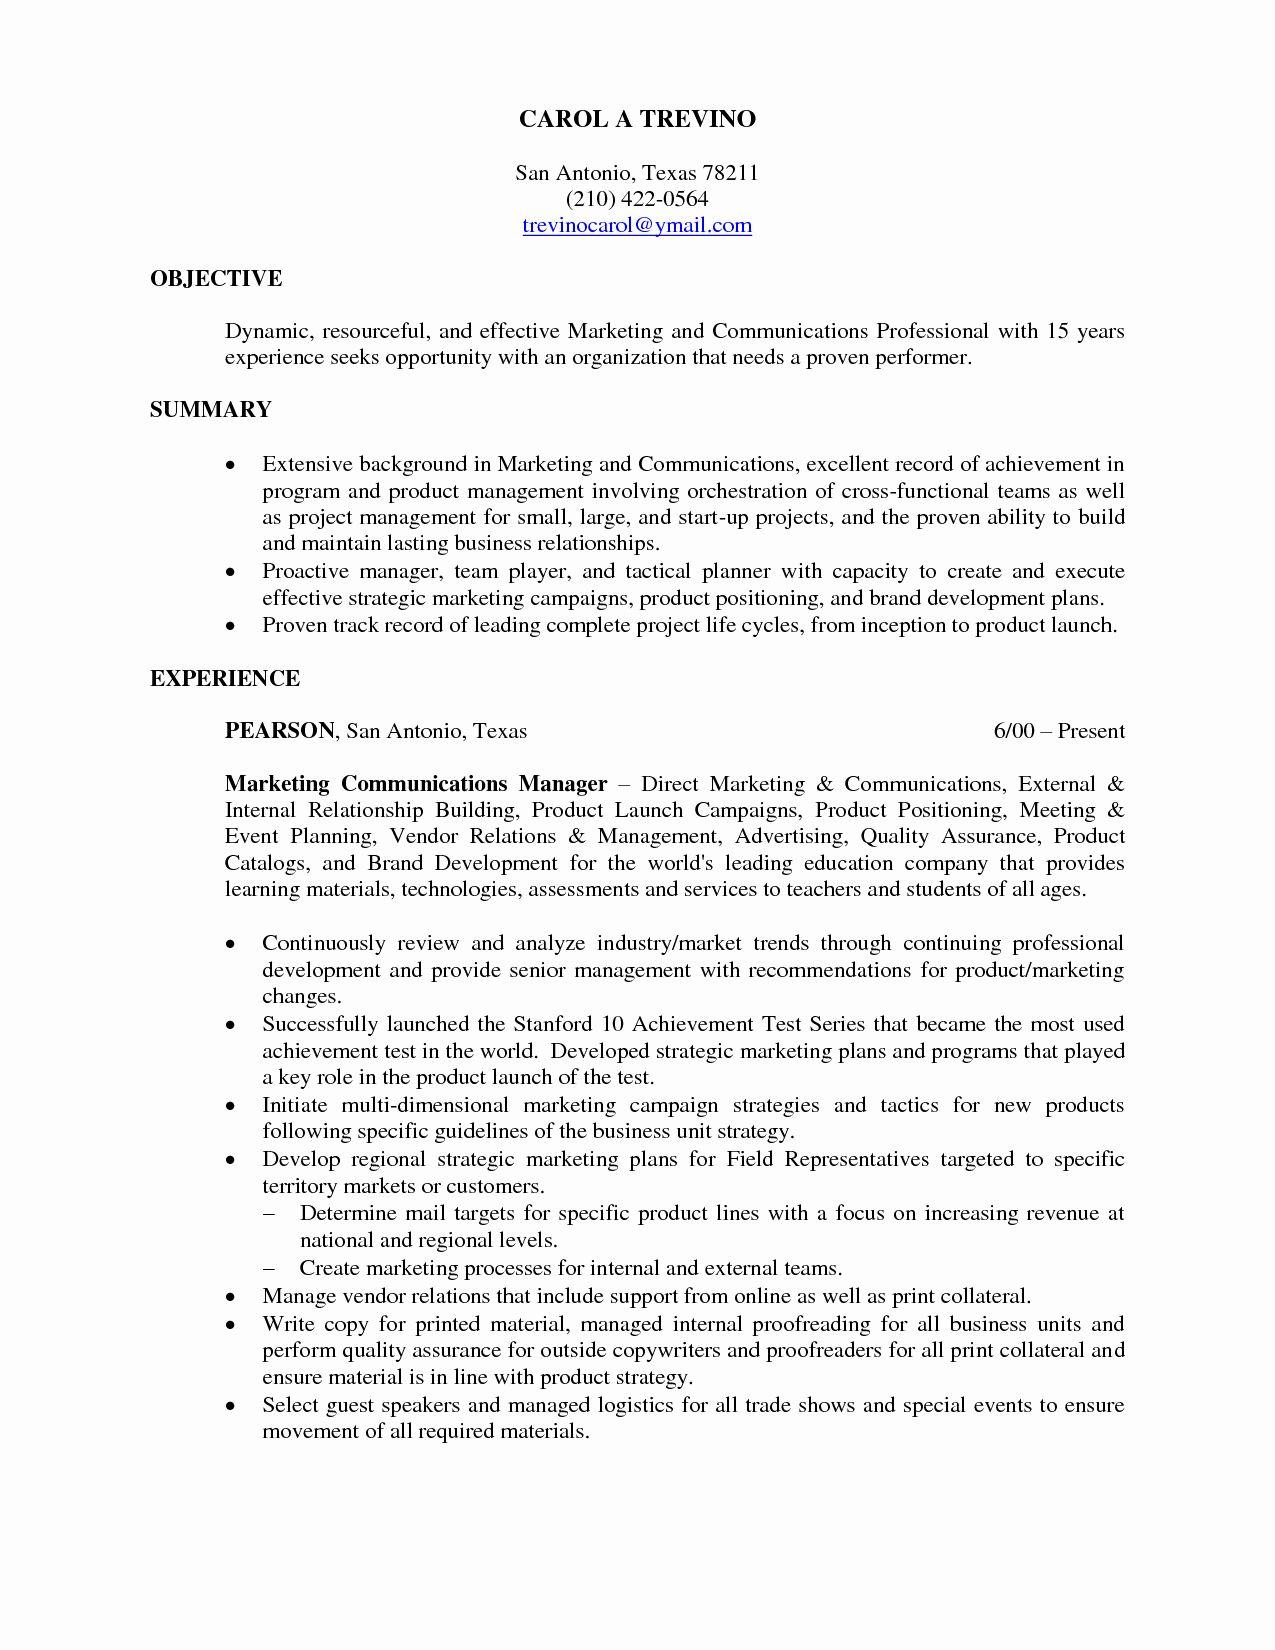 27 Objective for Internship Resume in 2020 Internship